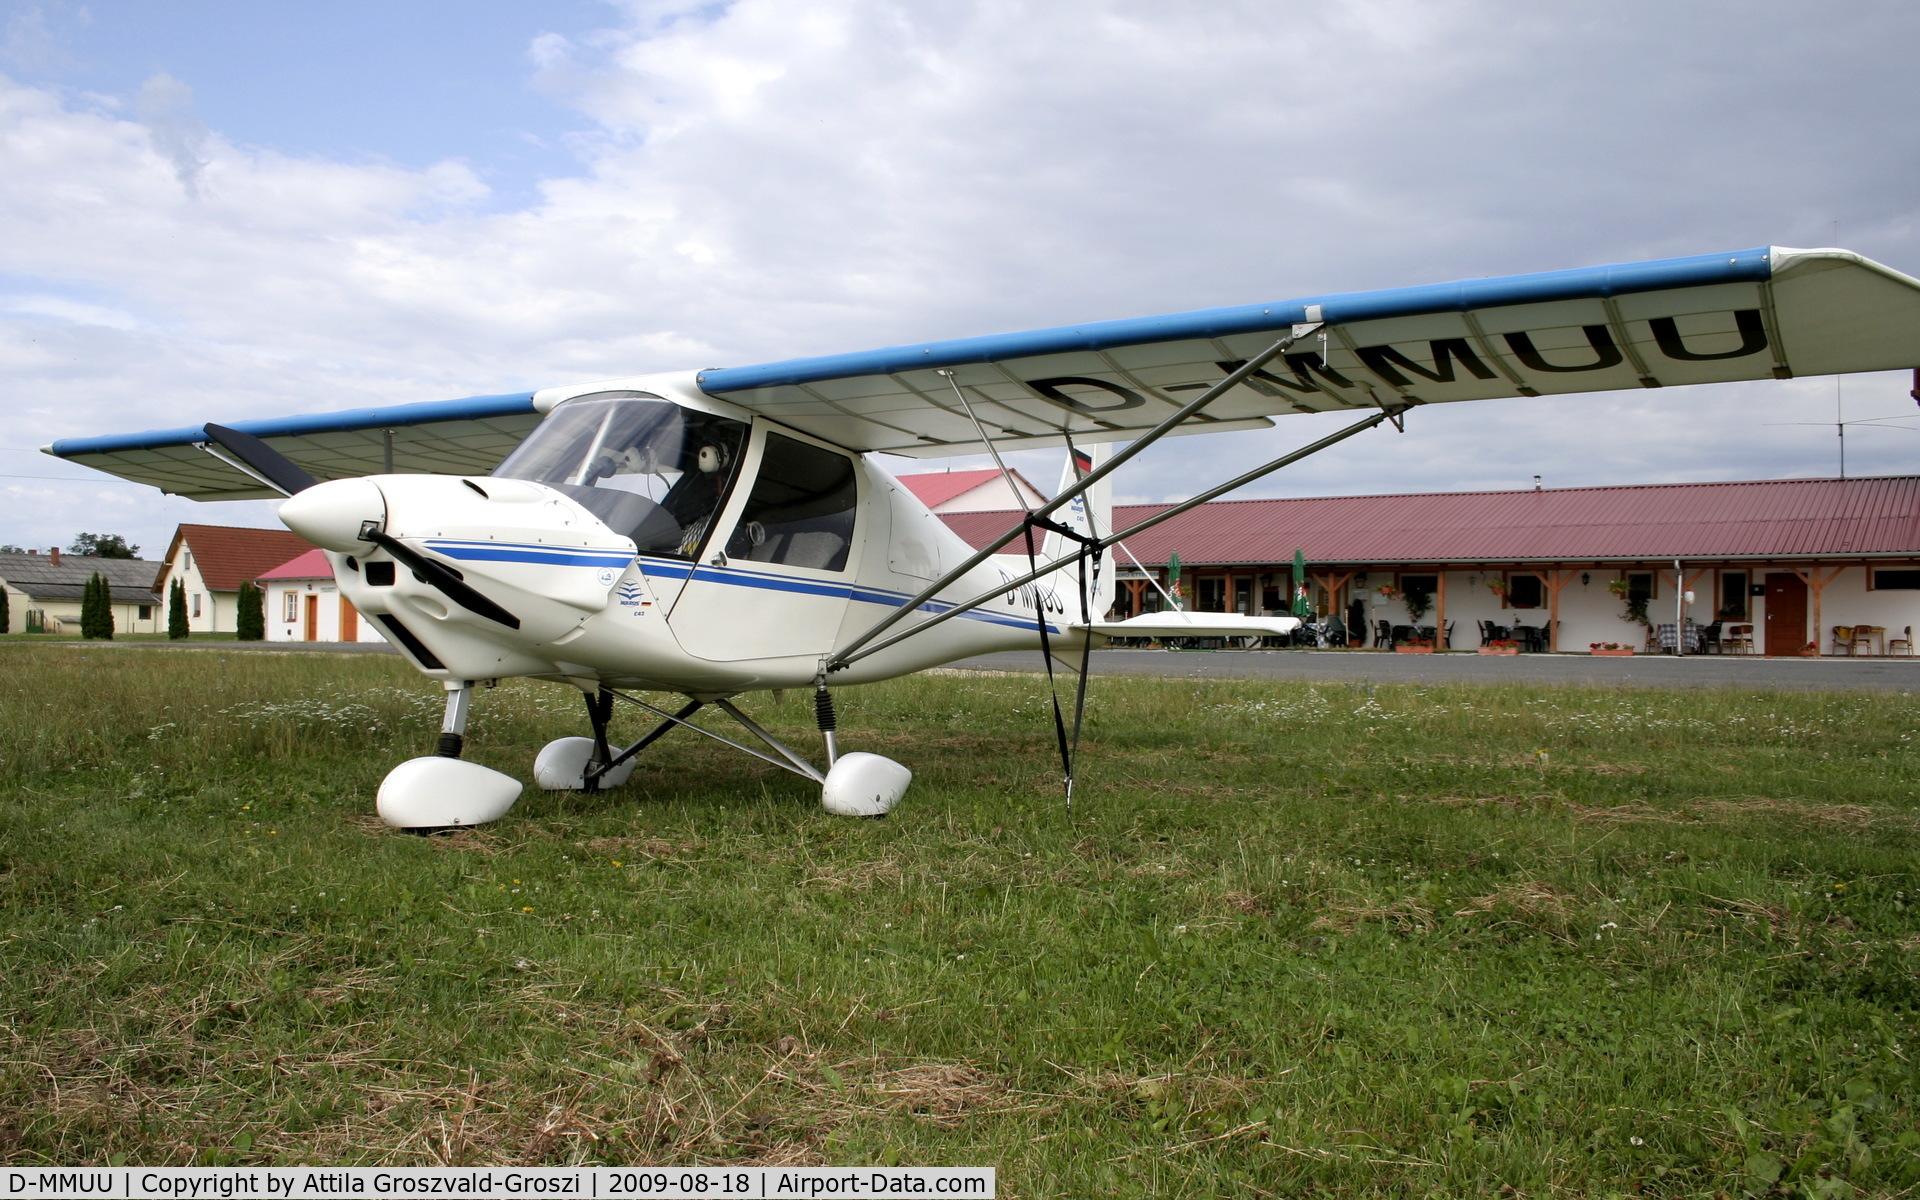 D-MMUU, 1998 Comco Ikarus C42 C/N 9801-6060, Aero Sag Airport - Tokorcs Hungary